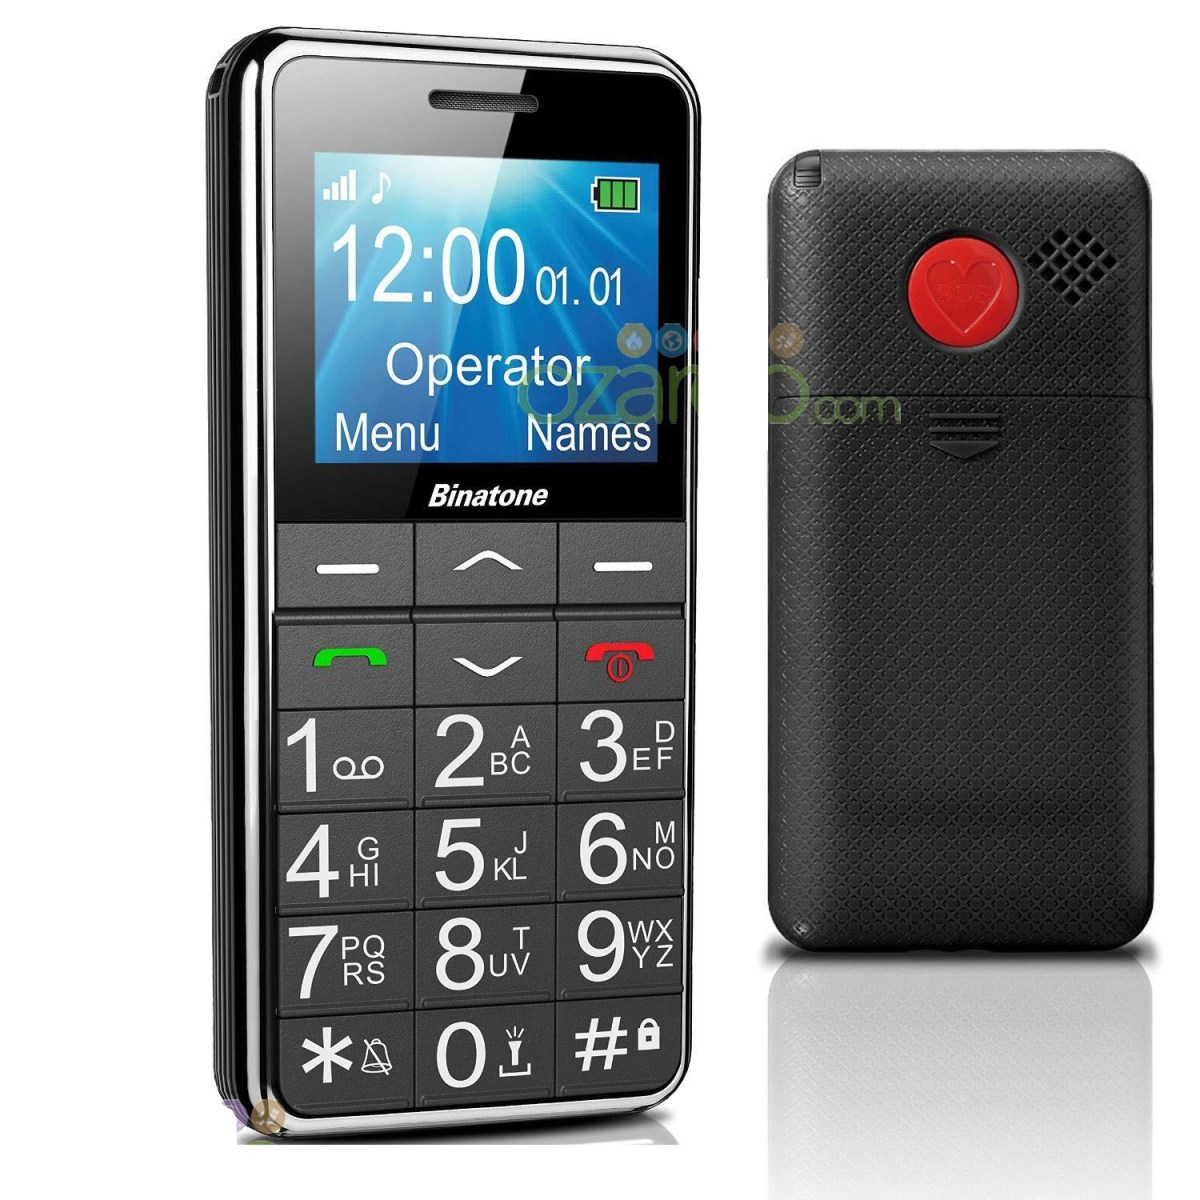 binatone big button mobile phone for senior citizen pcmacs. Black Bedroom Furniture Sets. Home Design Ideas